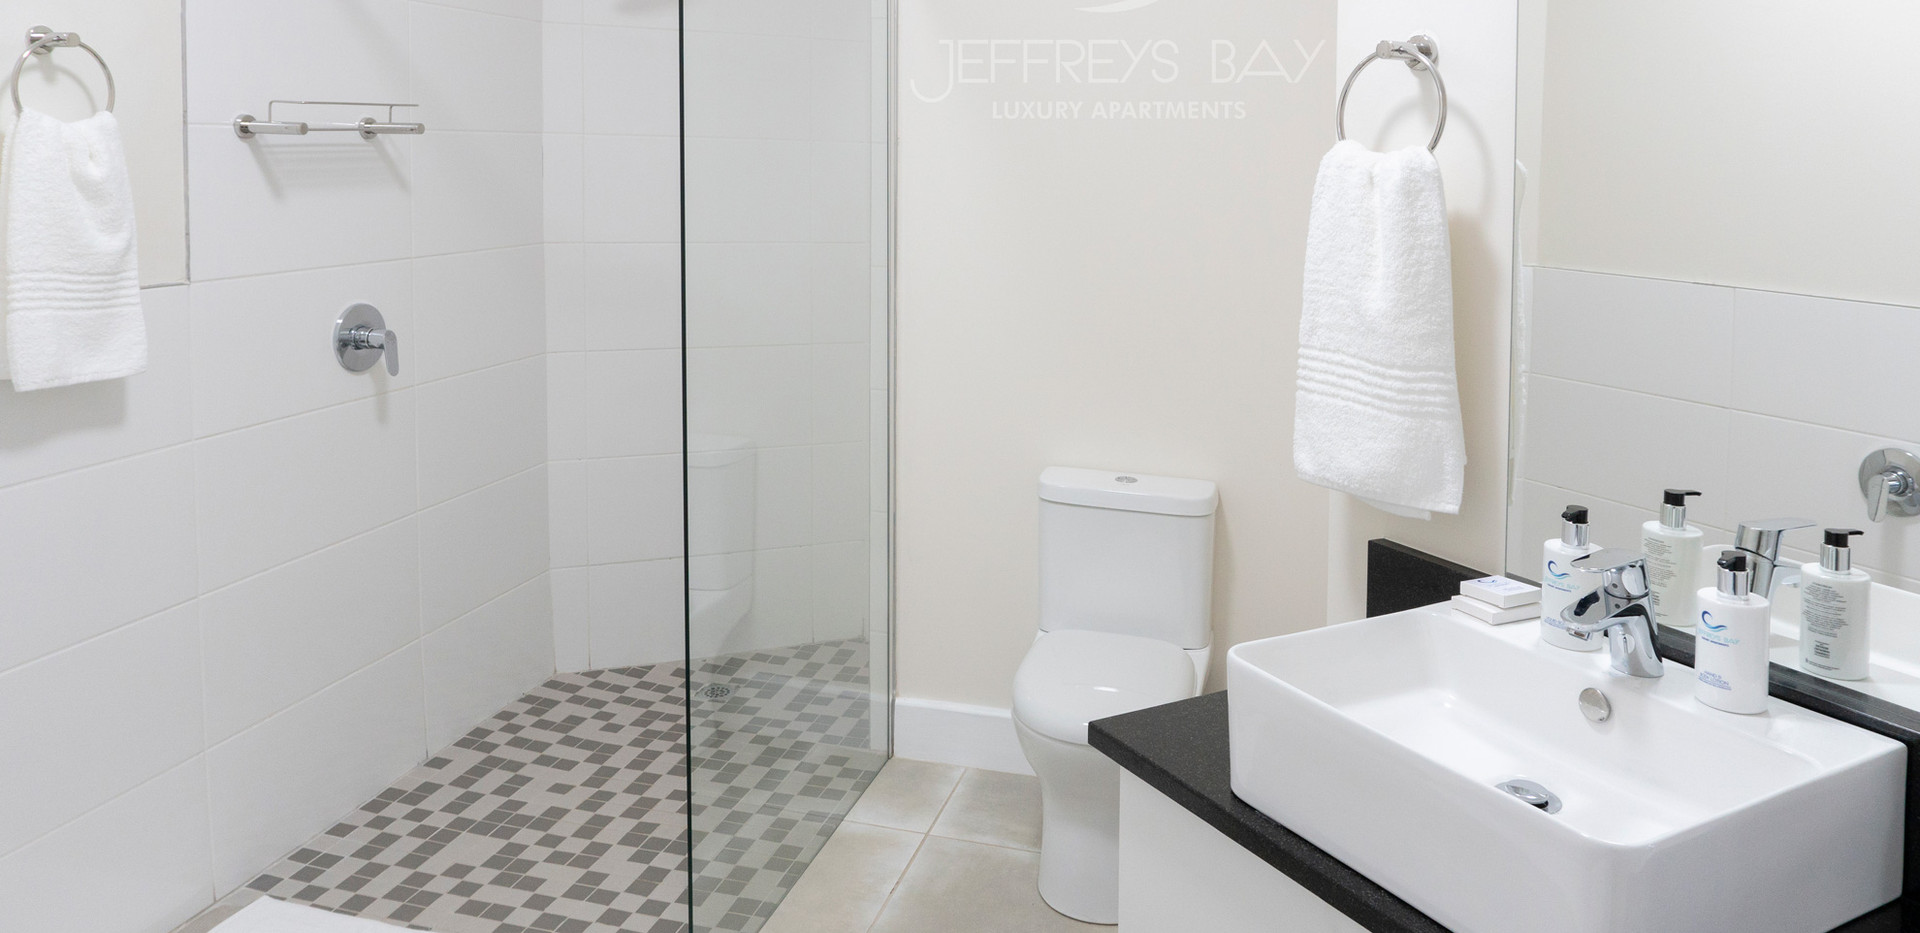 Jeffreysbay_Lux_apartments_Unit6_Bathroo